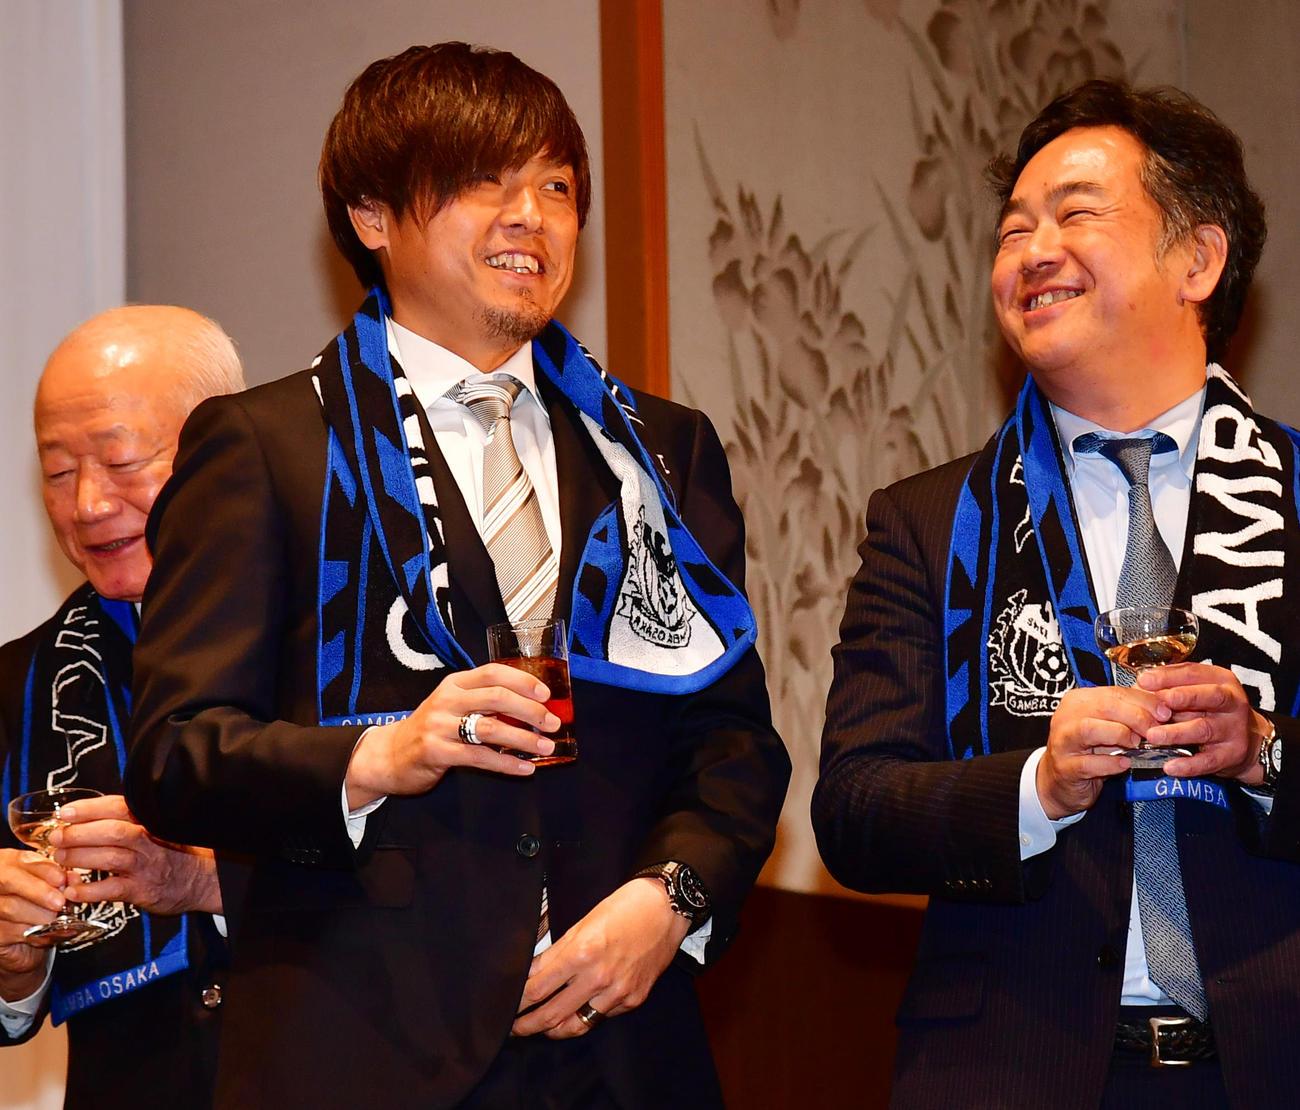 G大阪オフィシャルパーティーの完勝セレモニーで笑顔を見せるMF遠藤(左)ら(撮影・清水貴仁)